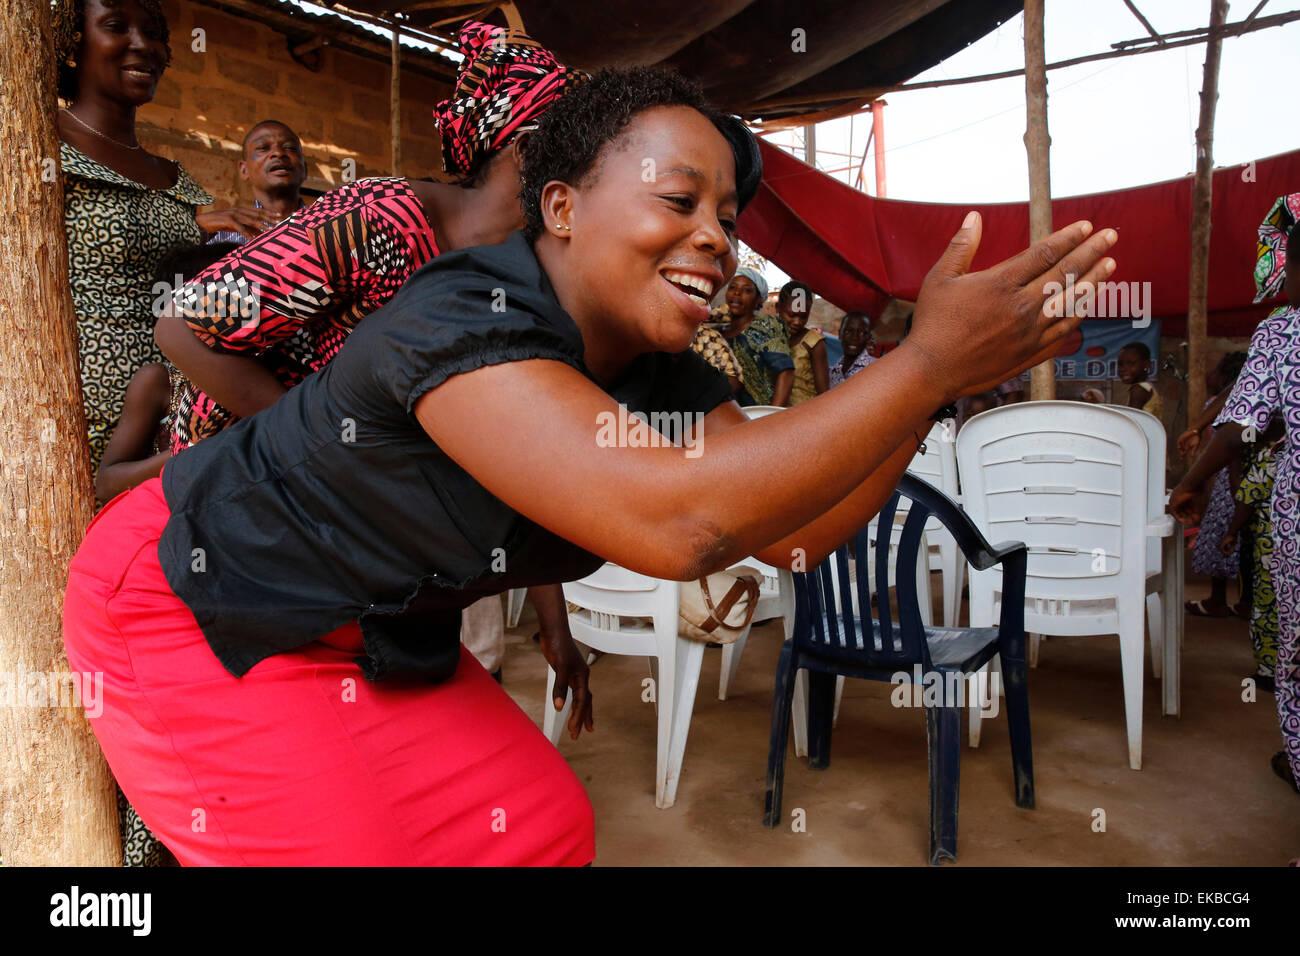 Pentecostal Sunday service, Missessinto, Benin, West Africa, Africa - Stock Image